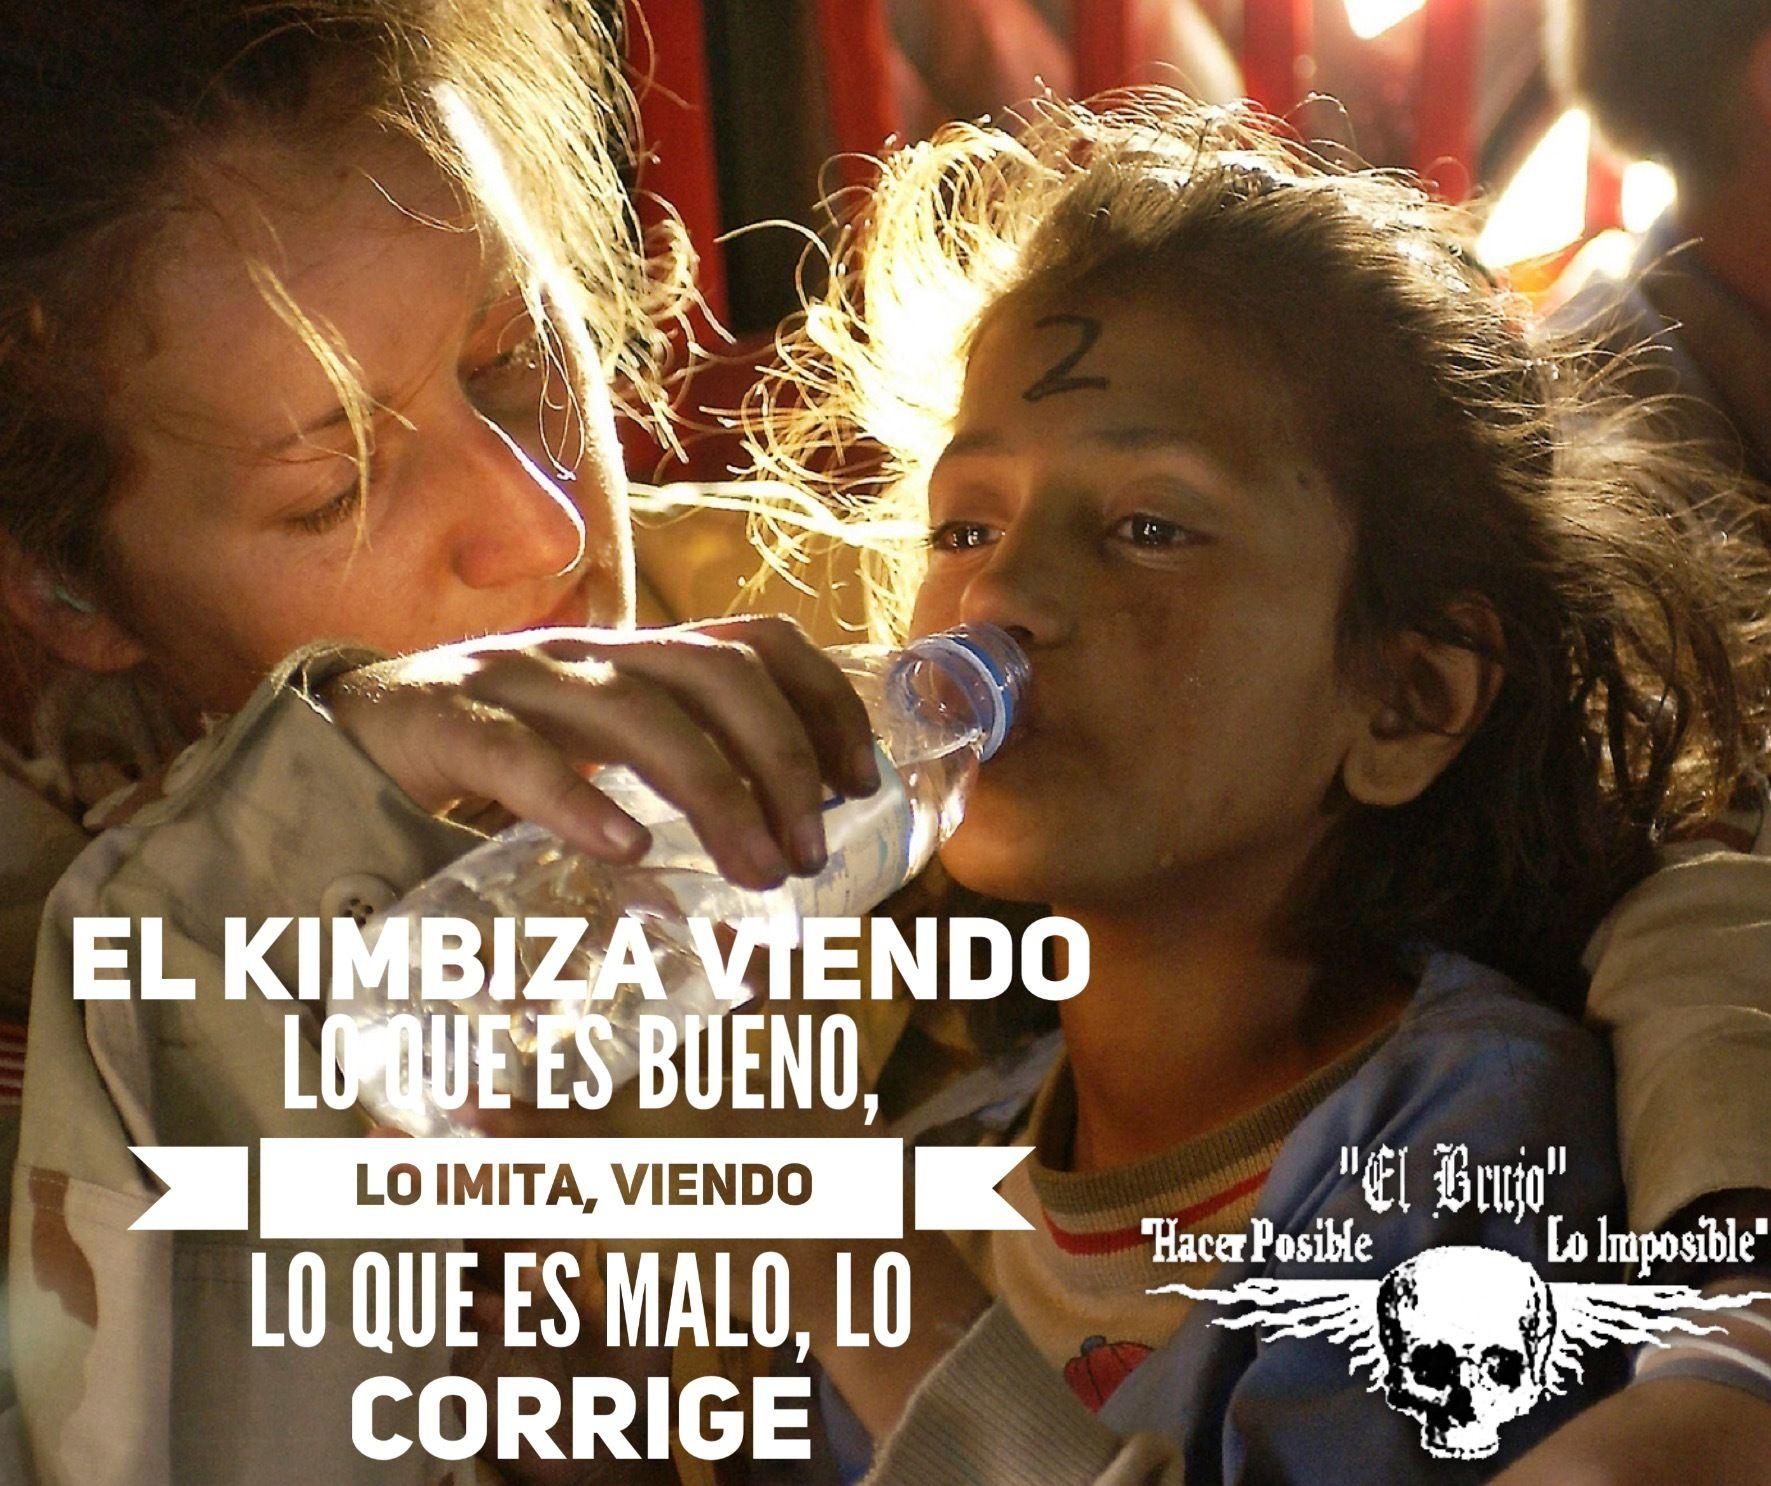 viendo #elbrujo.net #Kimbiza #brujeria #sabiduria #reflexion #enseñanzas #secretos #mensajes #dios